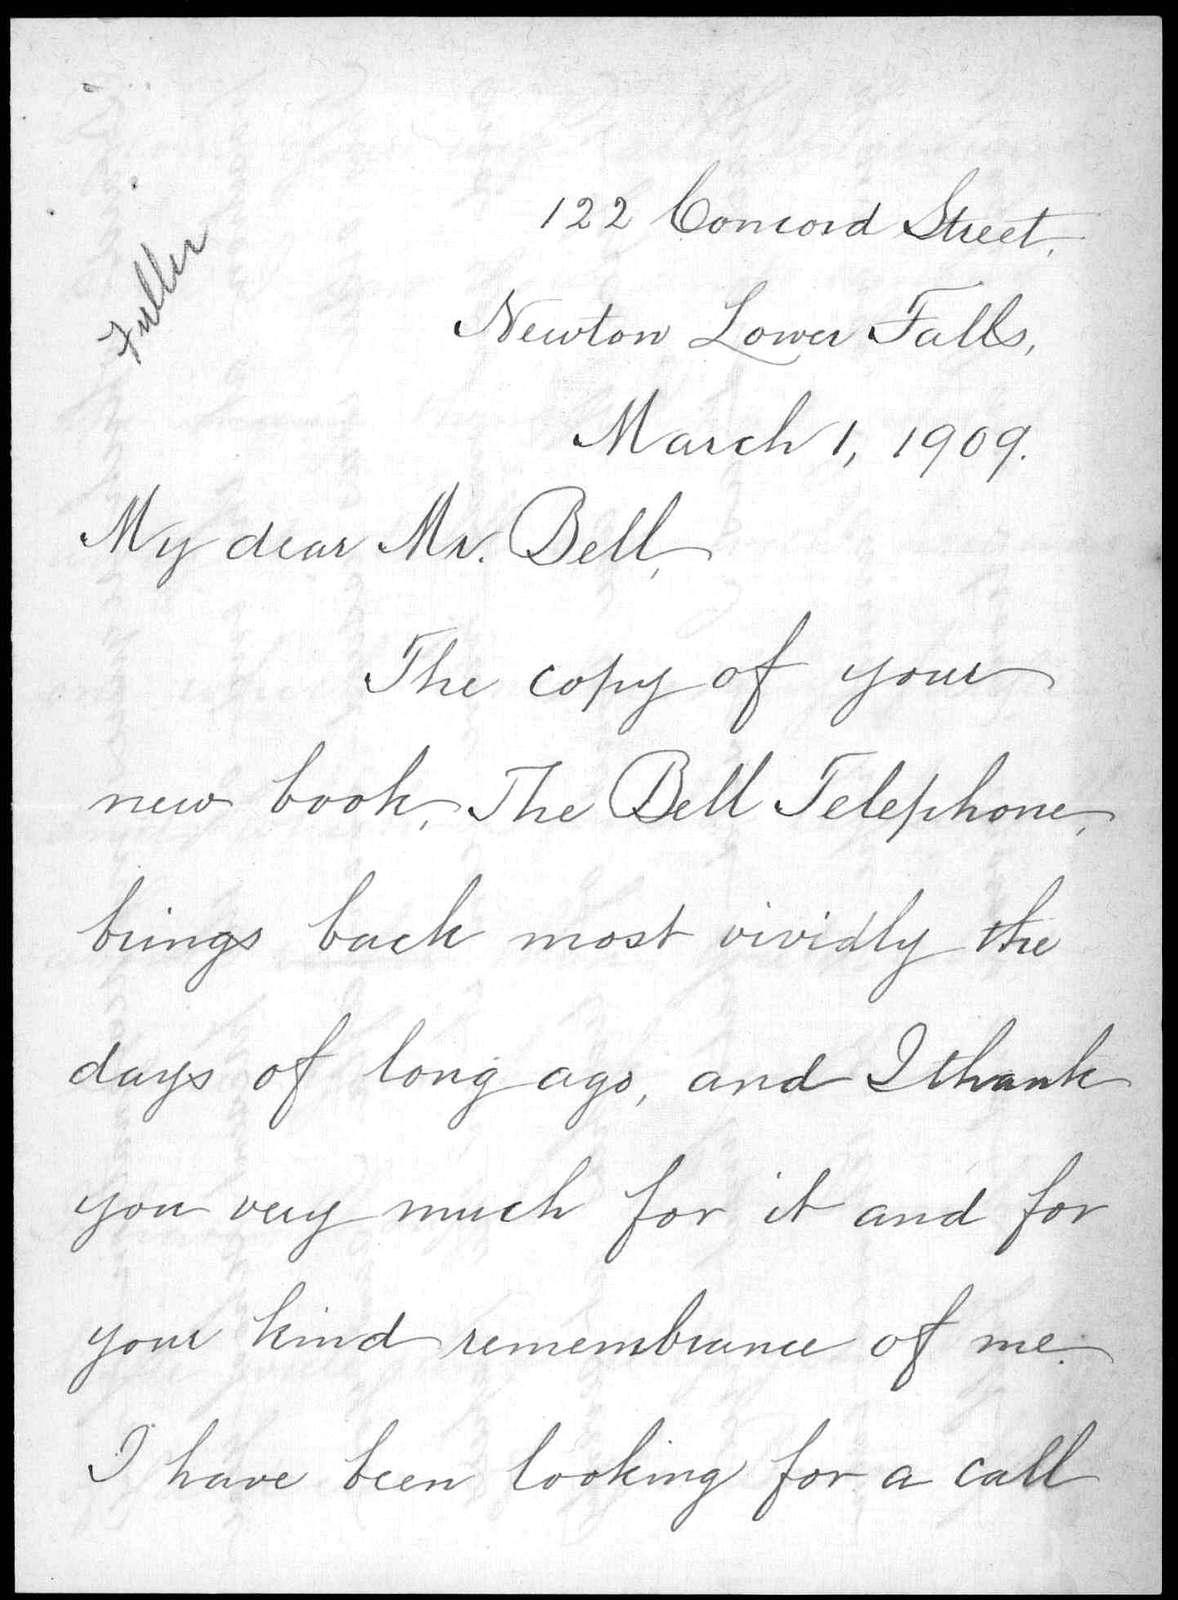 Letter from Sarah Fuller to Alexander Graham Bell, March 1, 1909